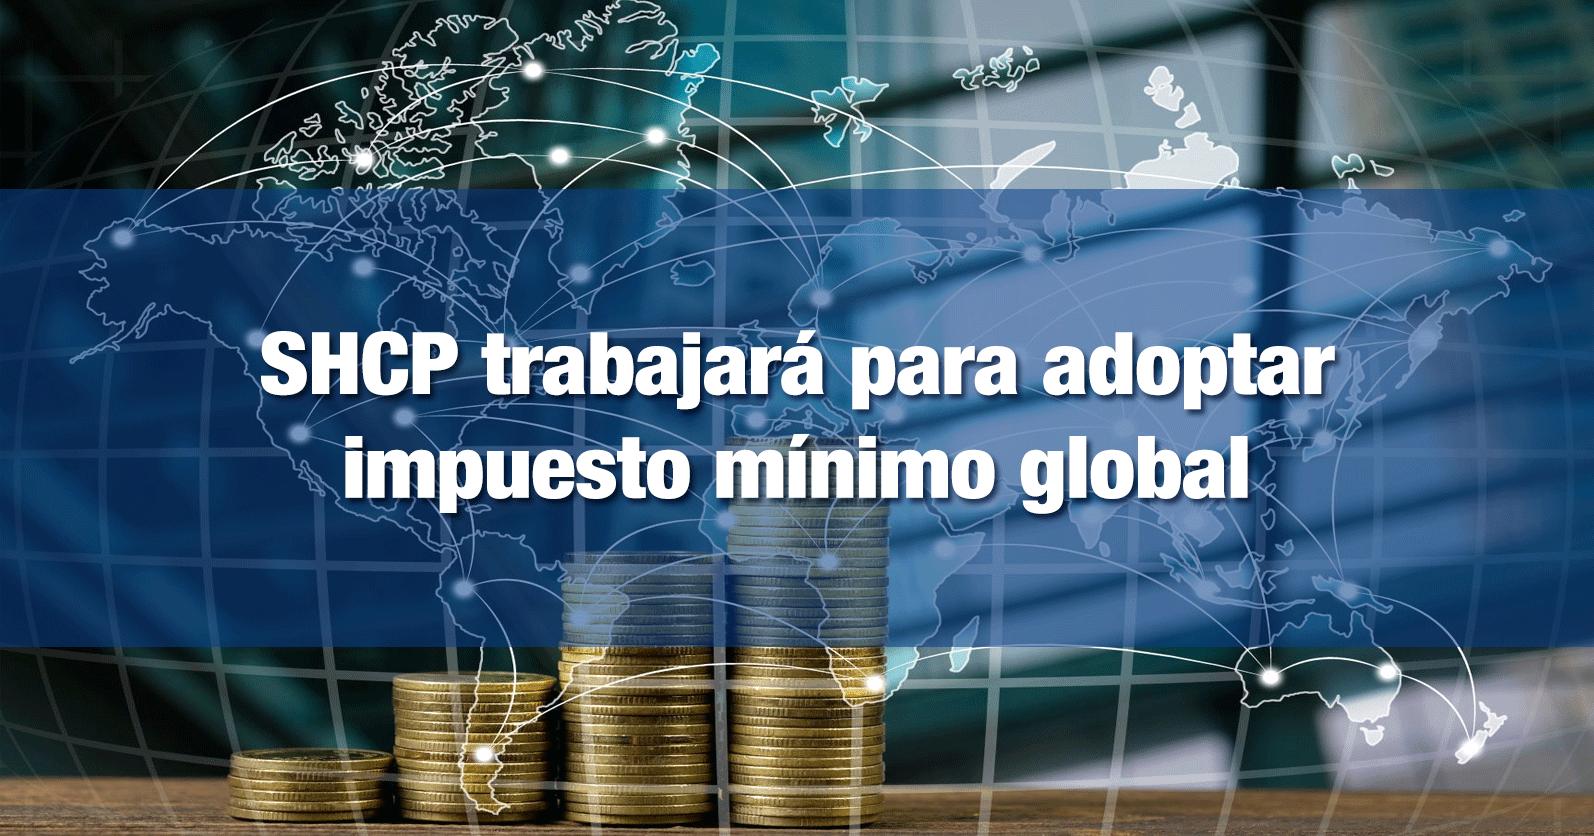 SHCP trabajará para adoptar impuesto mínimo global